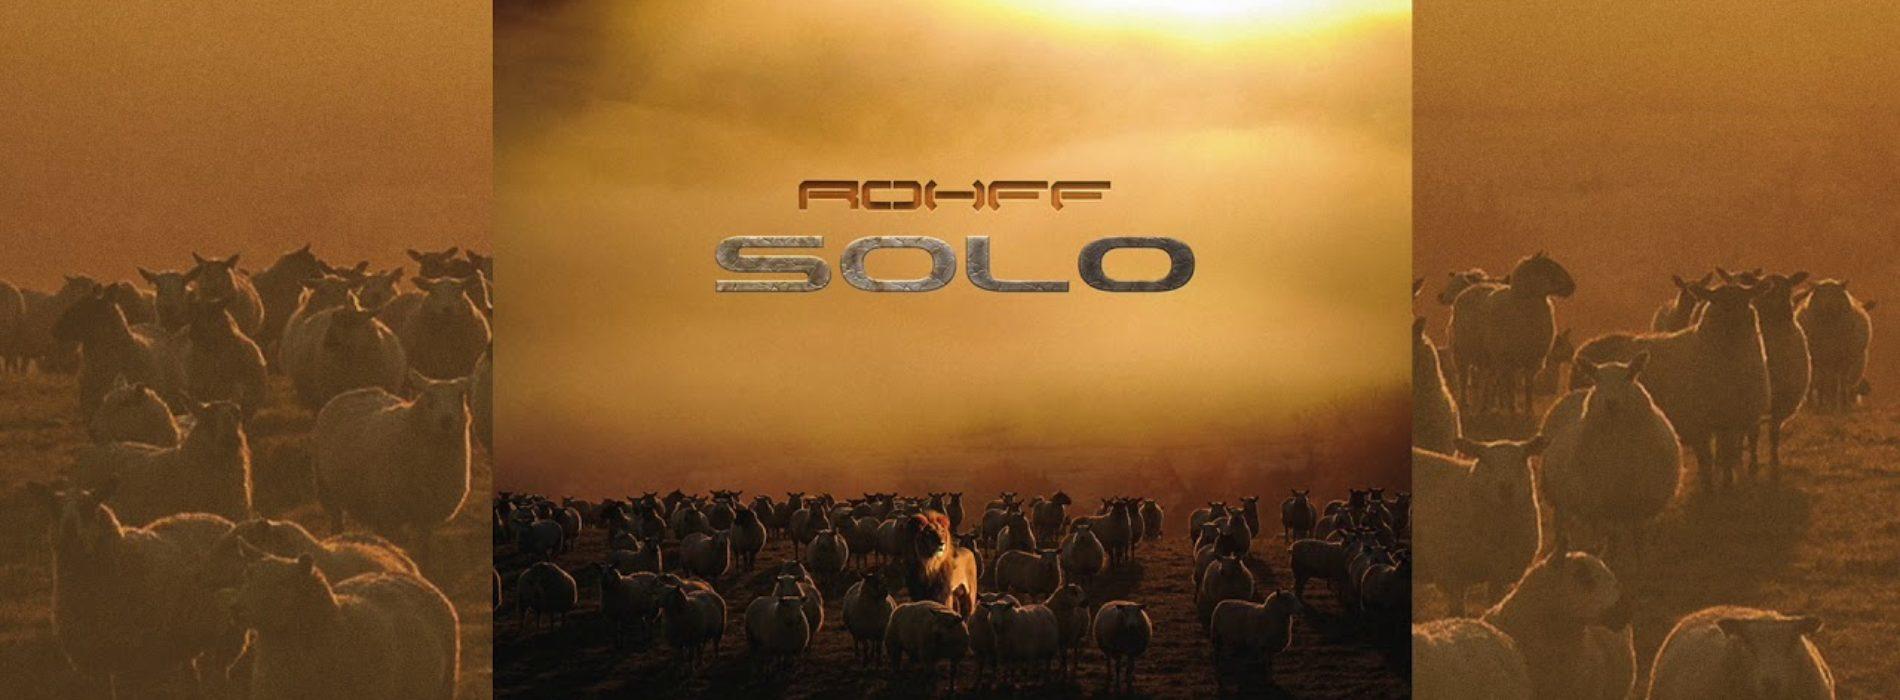 Rohff – Solo [Audio Officiel] – Mars 2020